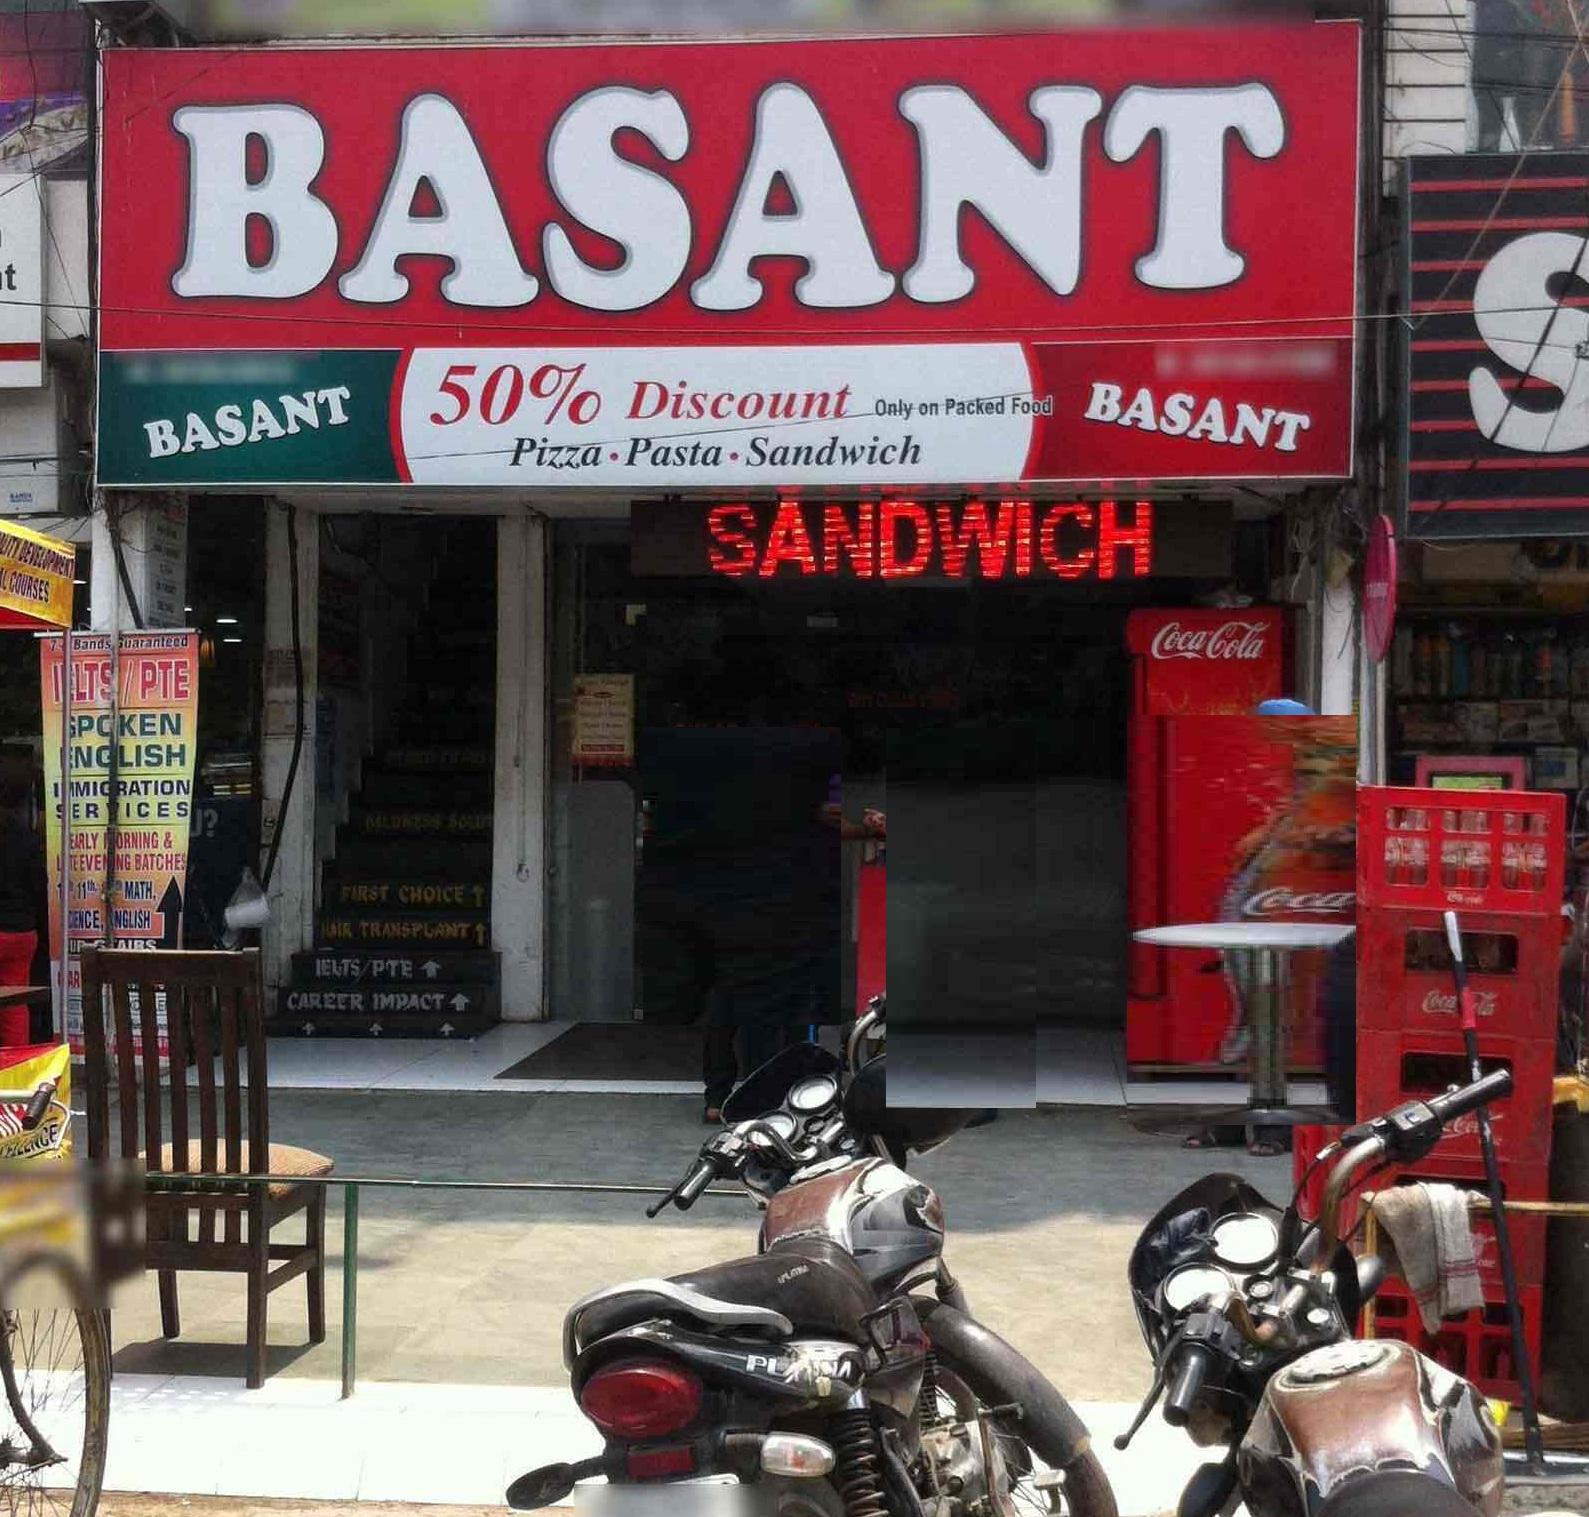 Basant Restaurant - Dugri - Ludhiana Image